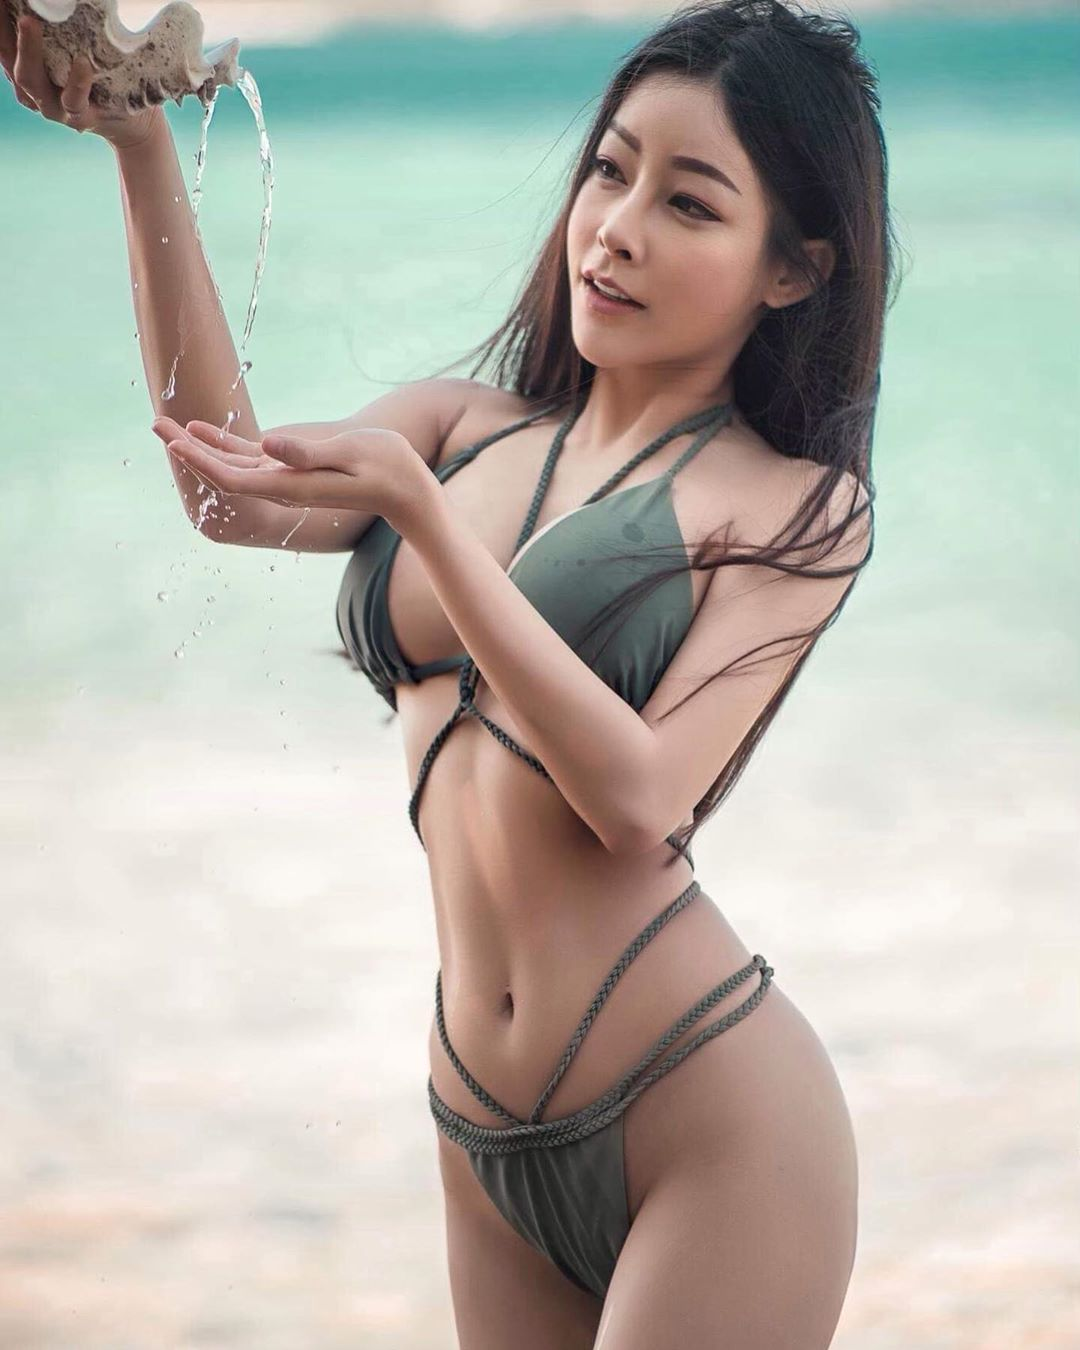 Ava Avaleza – Hot Thai Bikini Babes - Exotic Asian